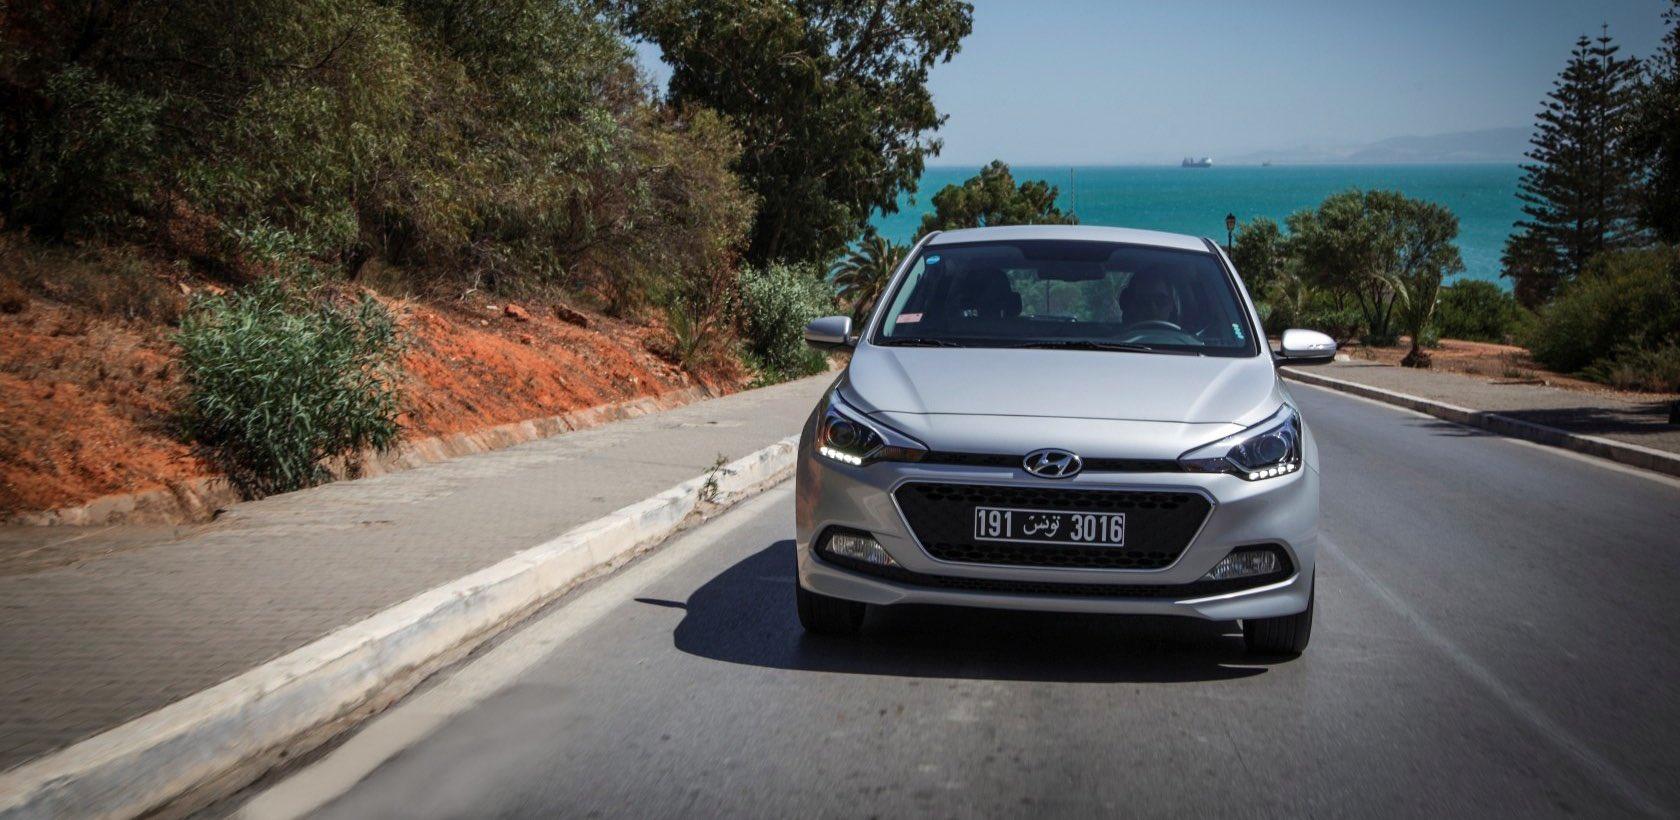 Essai de la nouvelle Hyundai i20 en Tunisie